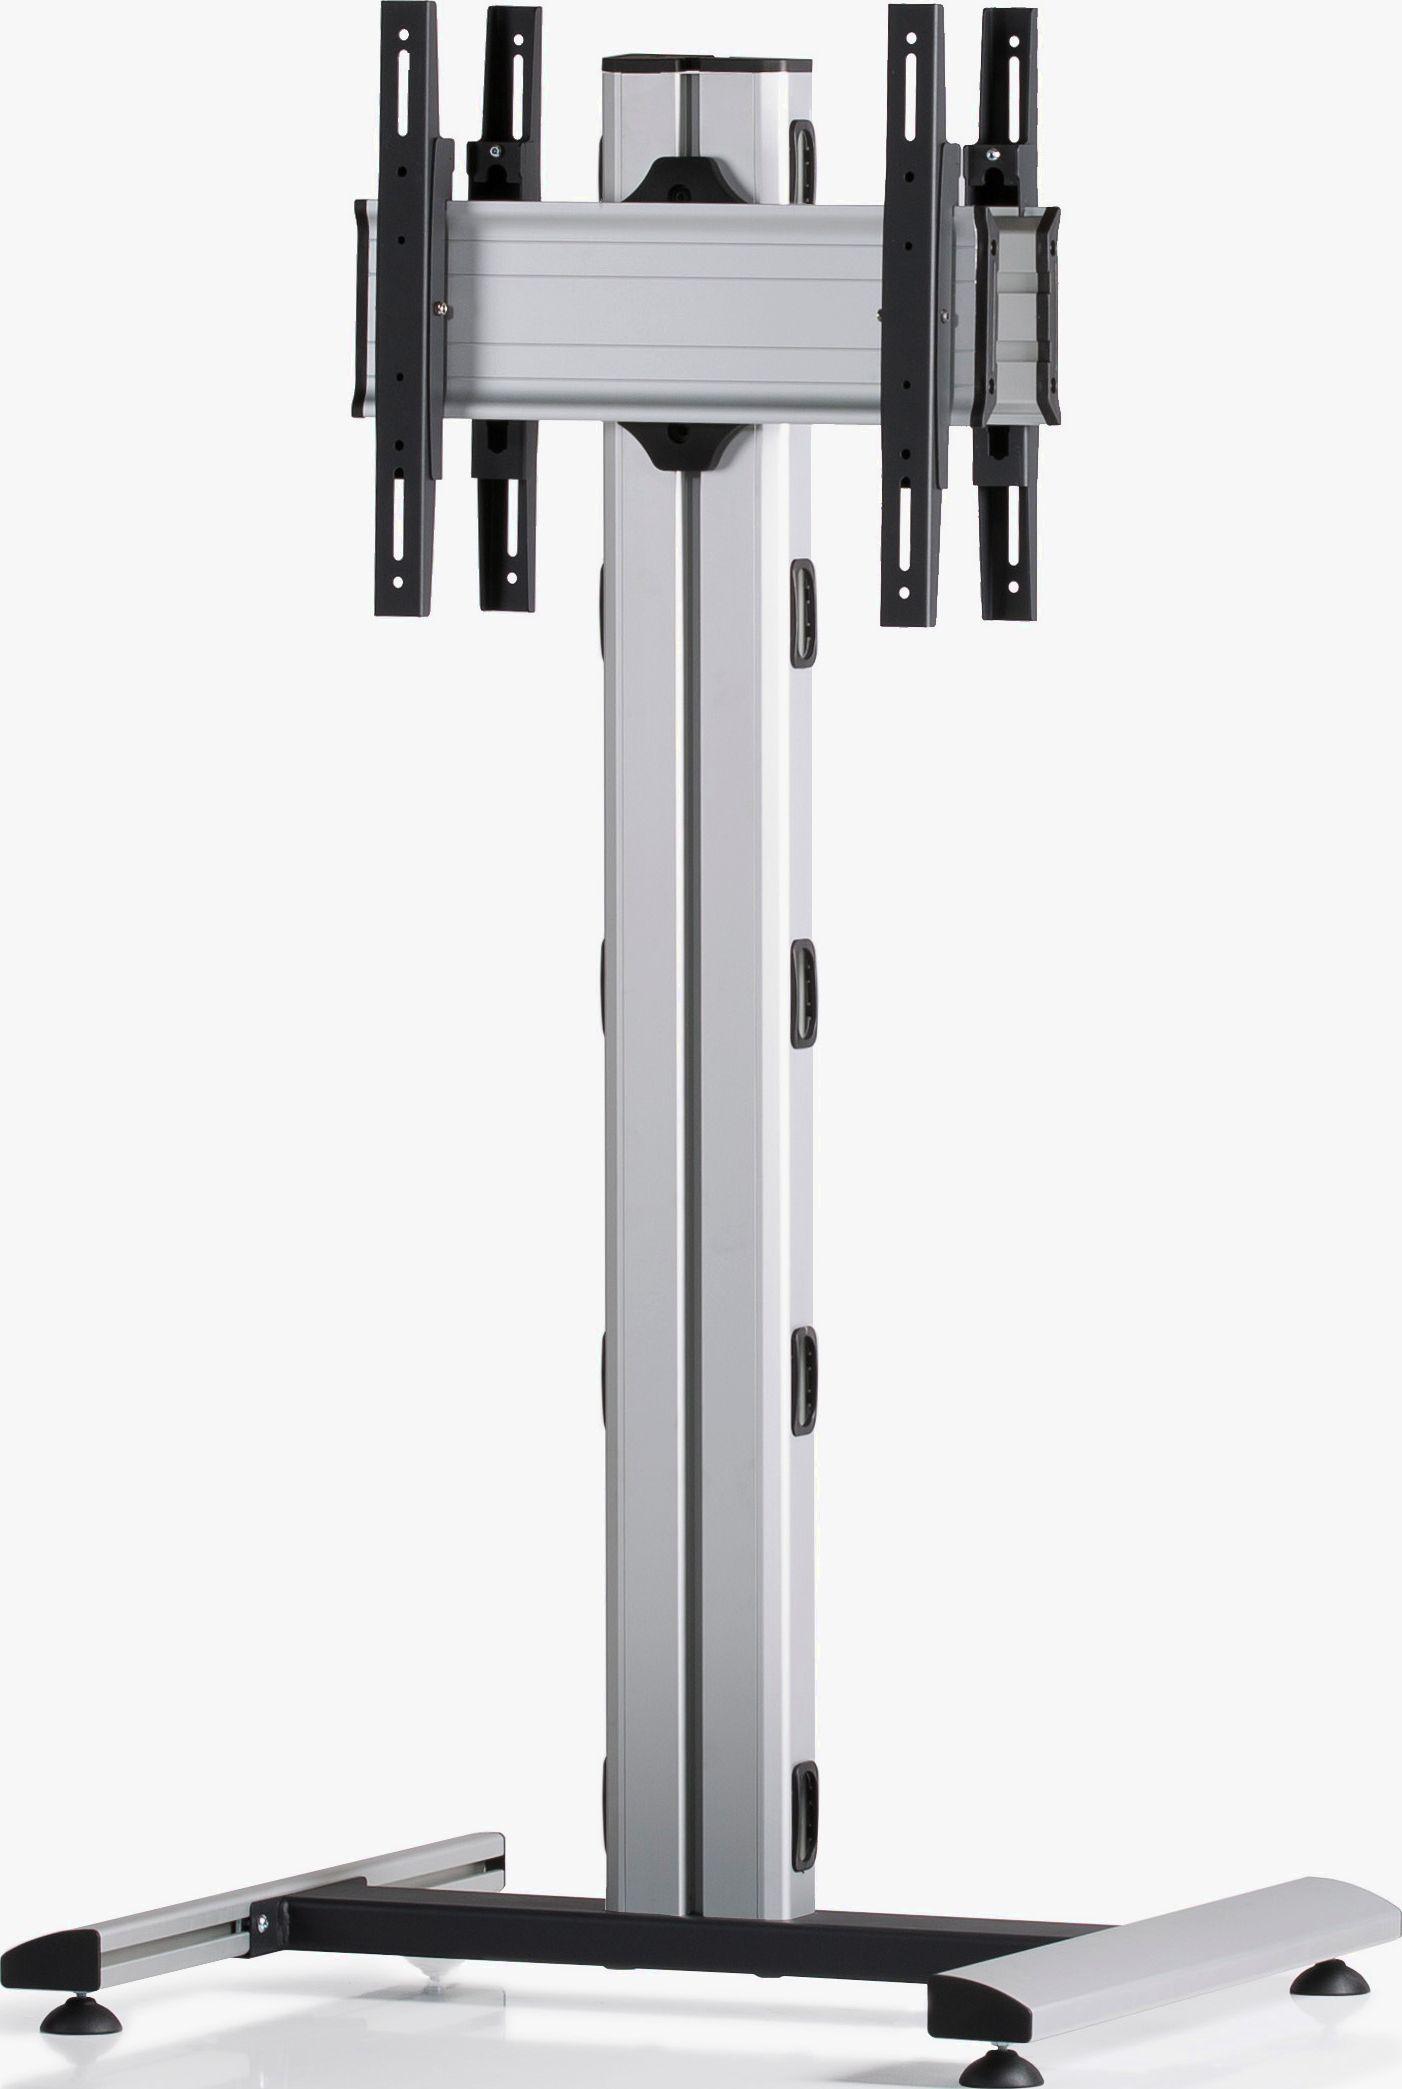 2 Displays 1×1 beidseitig, Höhe 135 cm, Standard-VESA, auf Standfuß